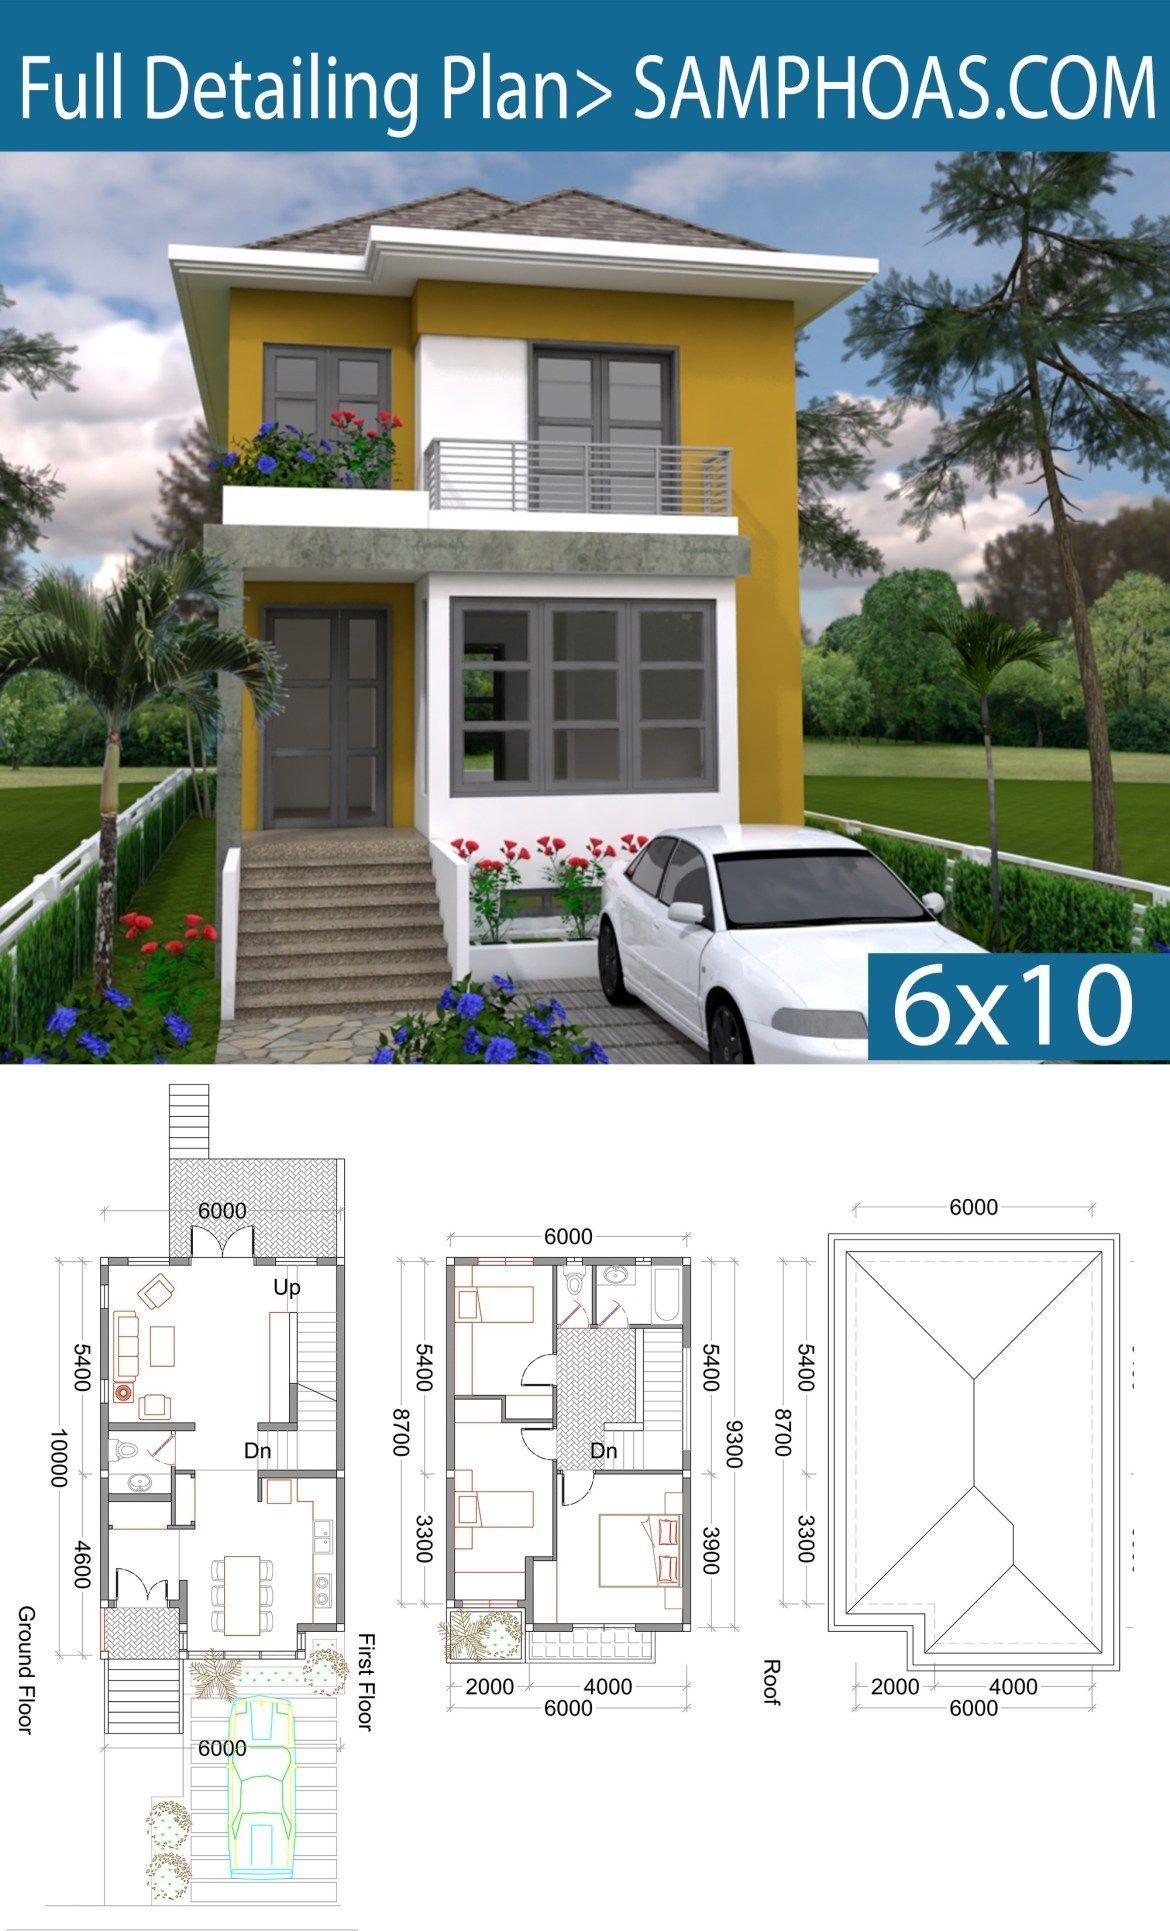 3 Bedrooms Small Home Design Plan 6x10m Samphoas Plansearch Smallhousedesign Homedesignplans Architectural House Plans Home Design Plan Small House Design